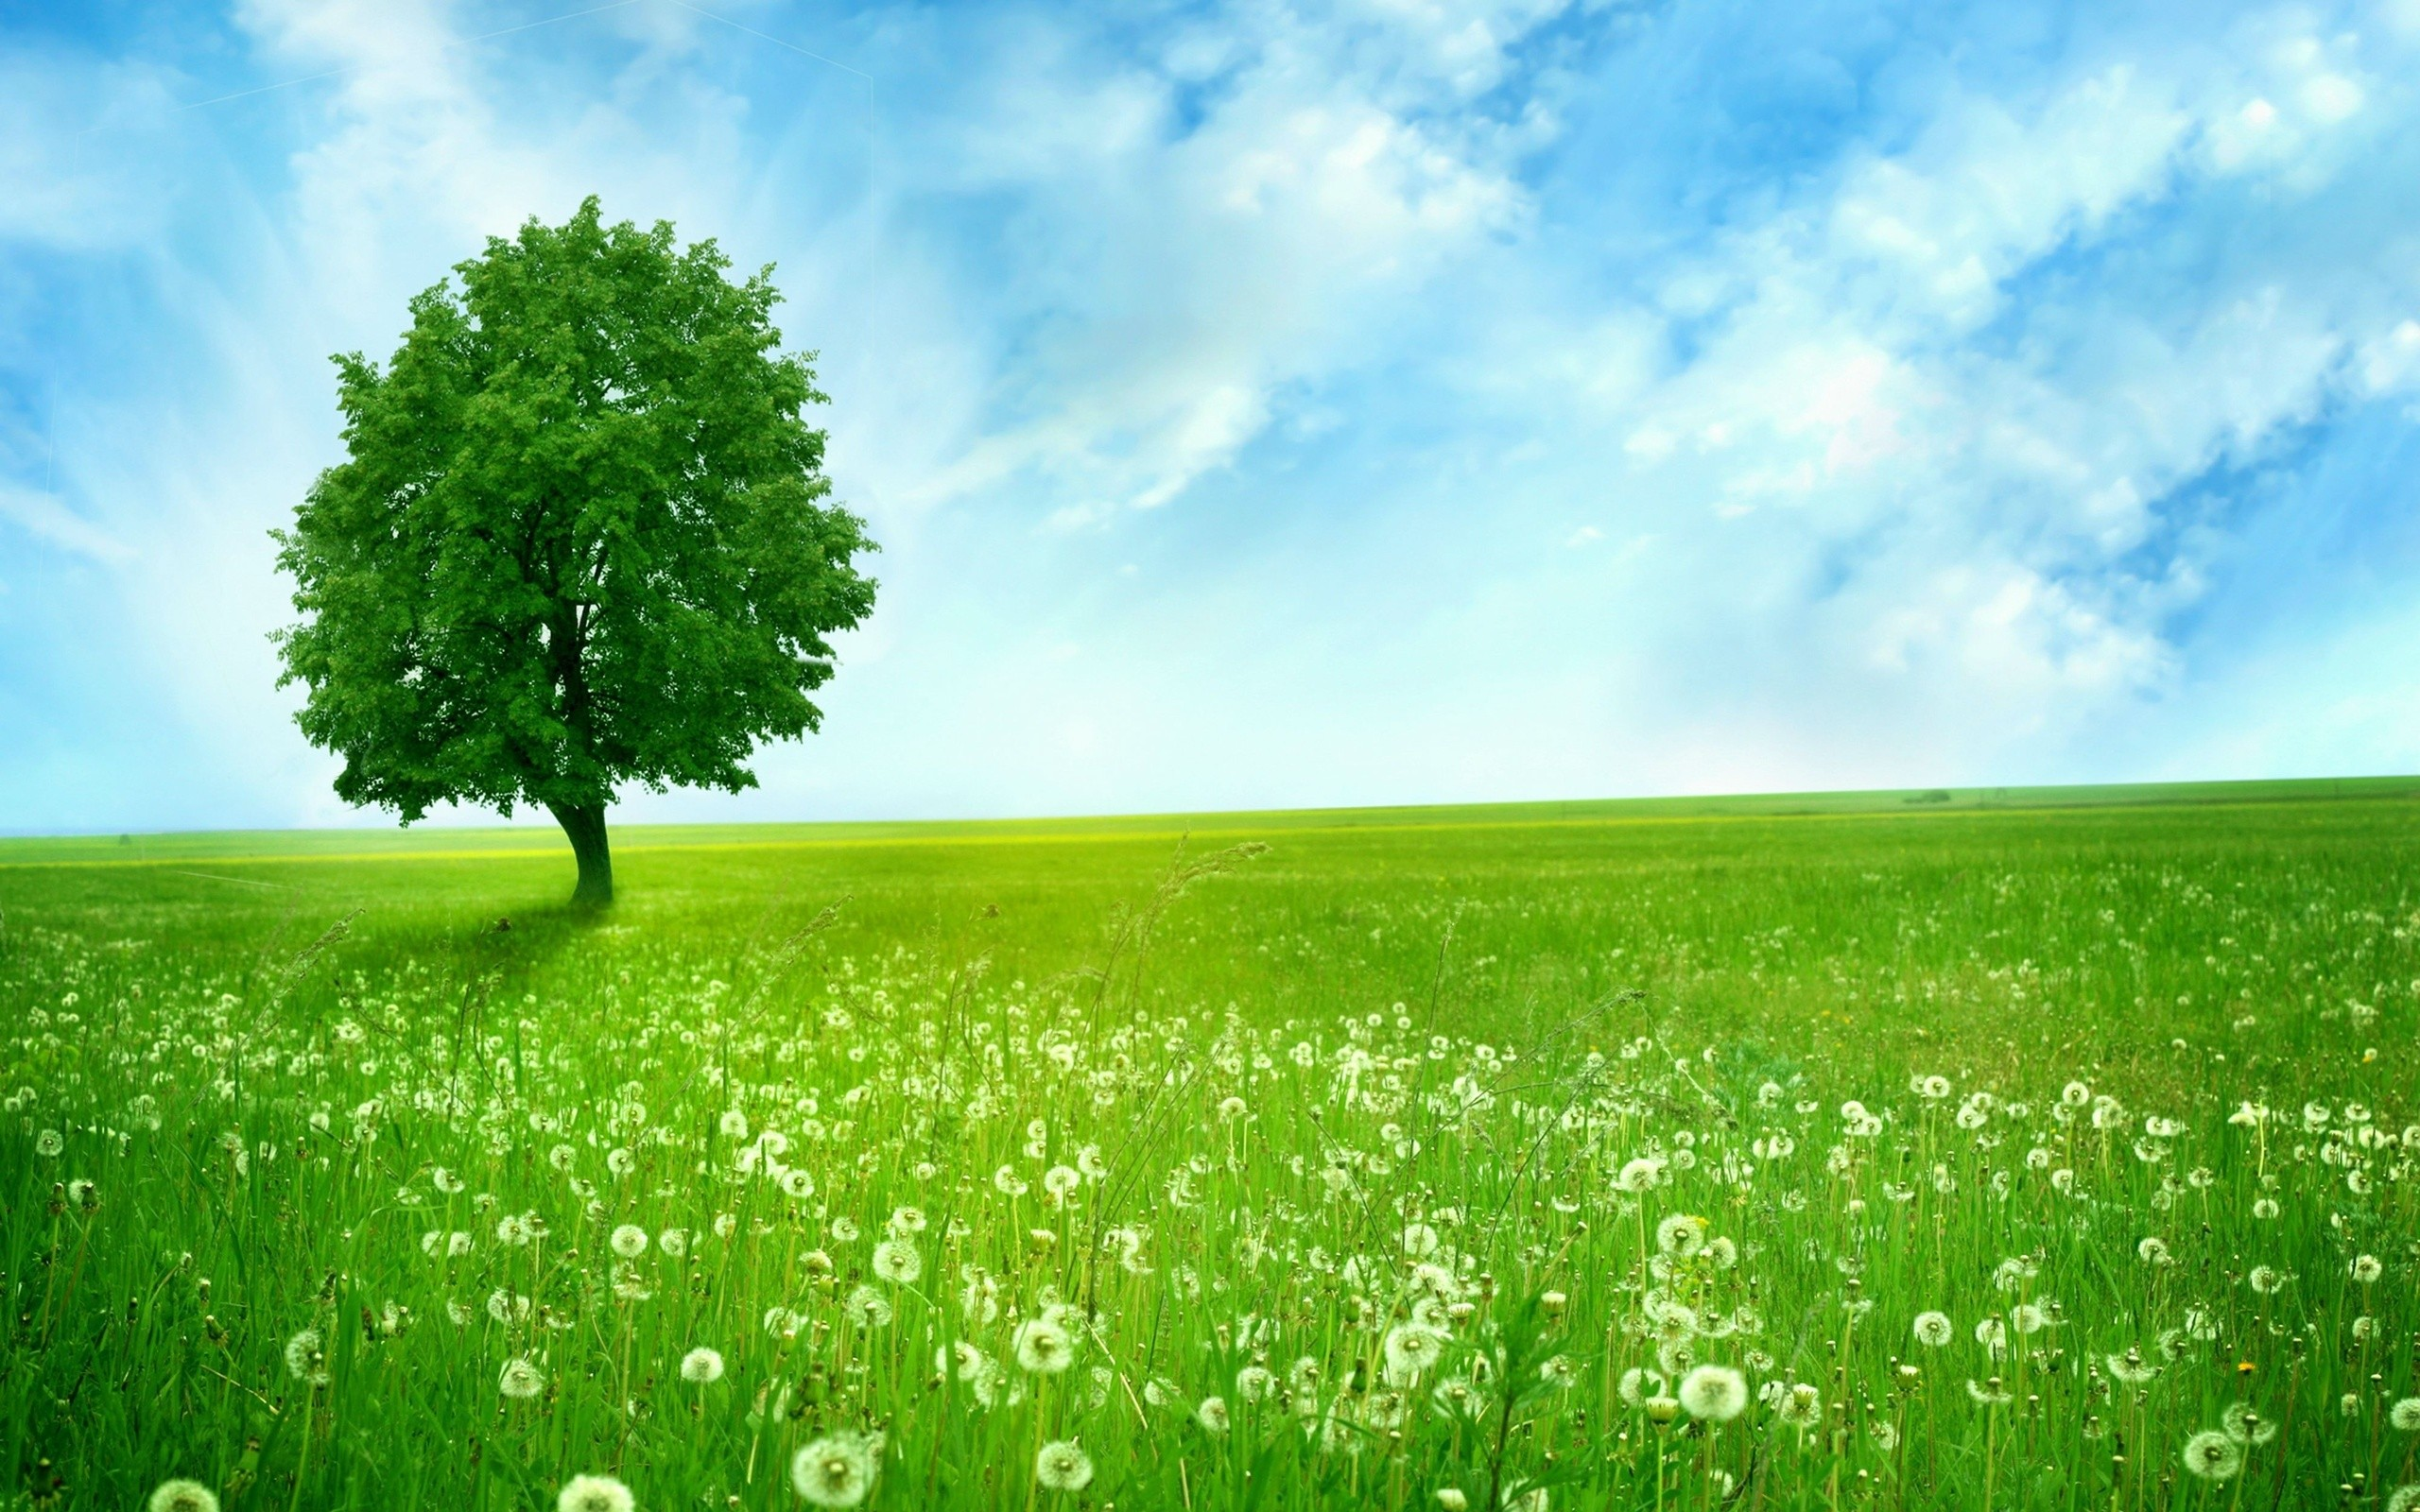 green tree in dandelion field full hd wallpaper and background image